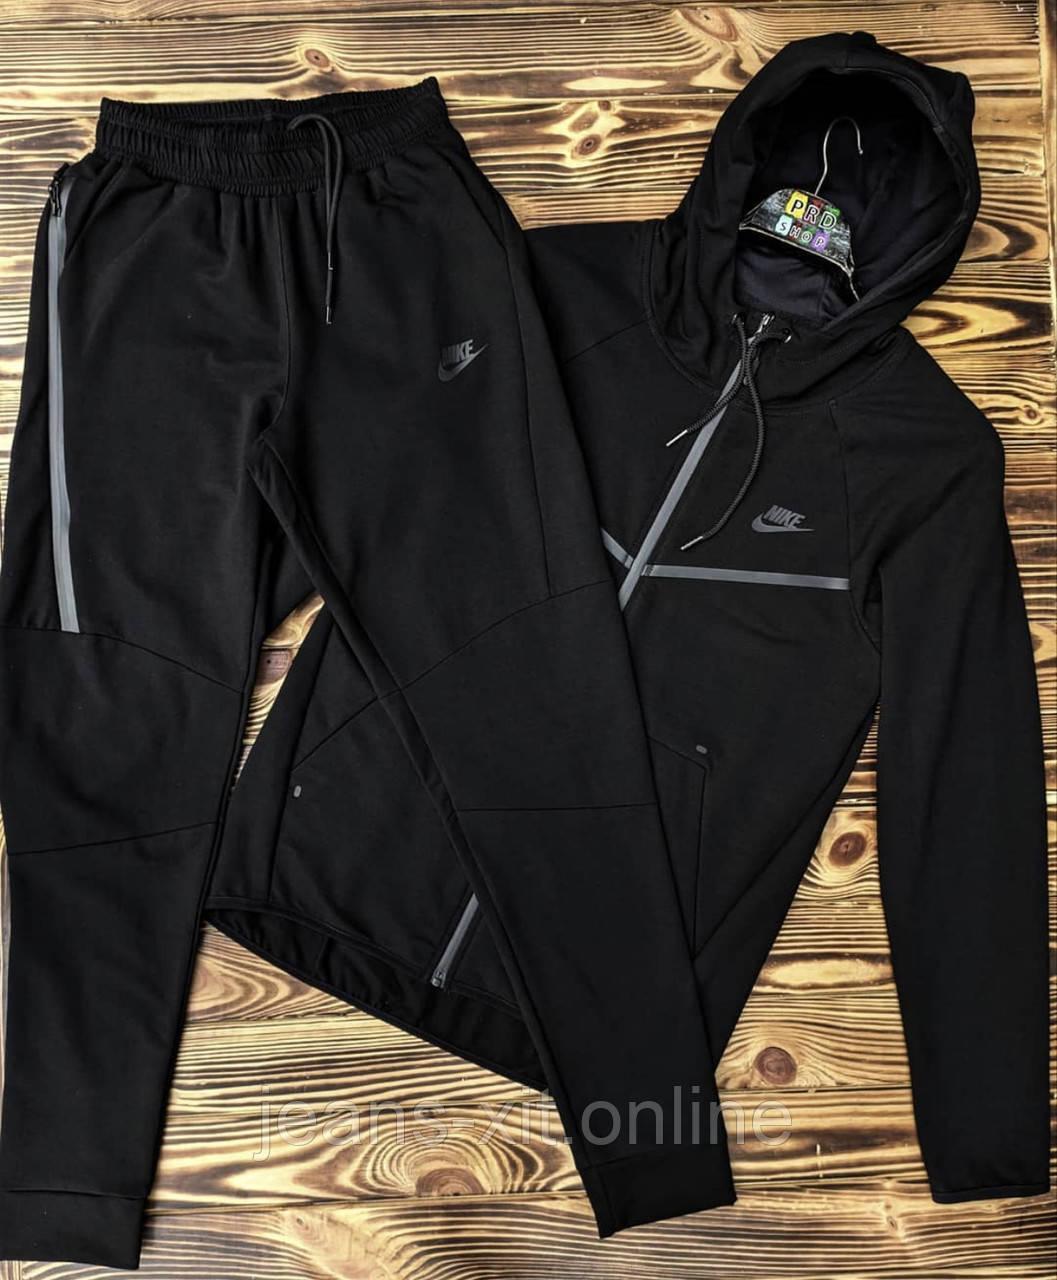 Костюм Чол. 2XL(р) чорний 008-20 Nike Туреччина Весна-C